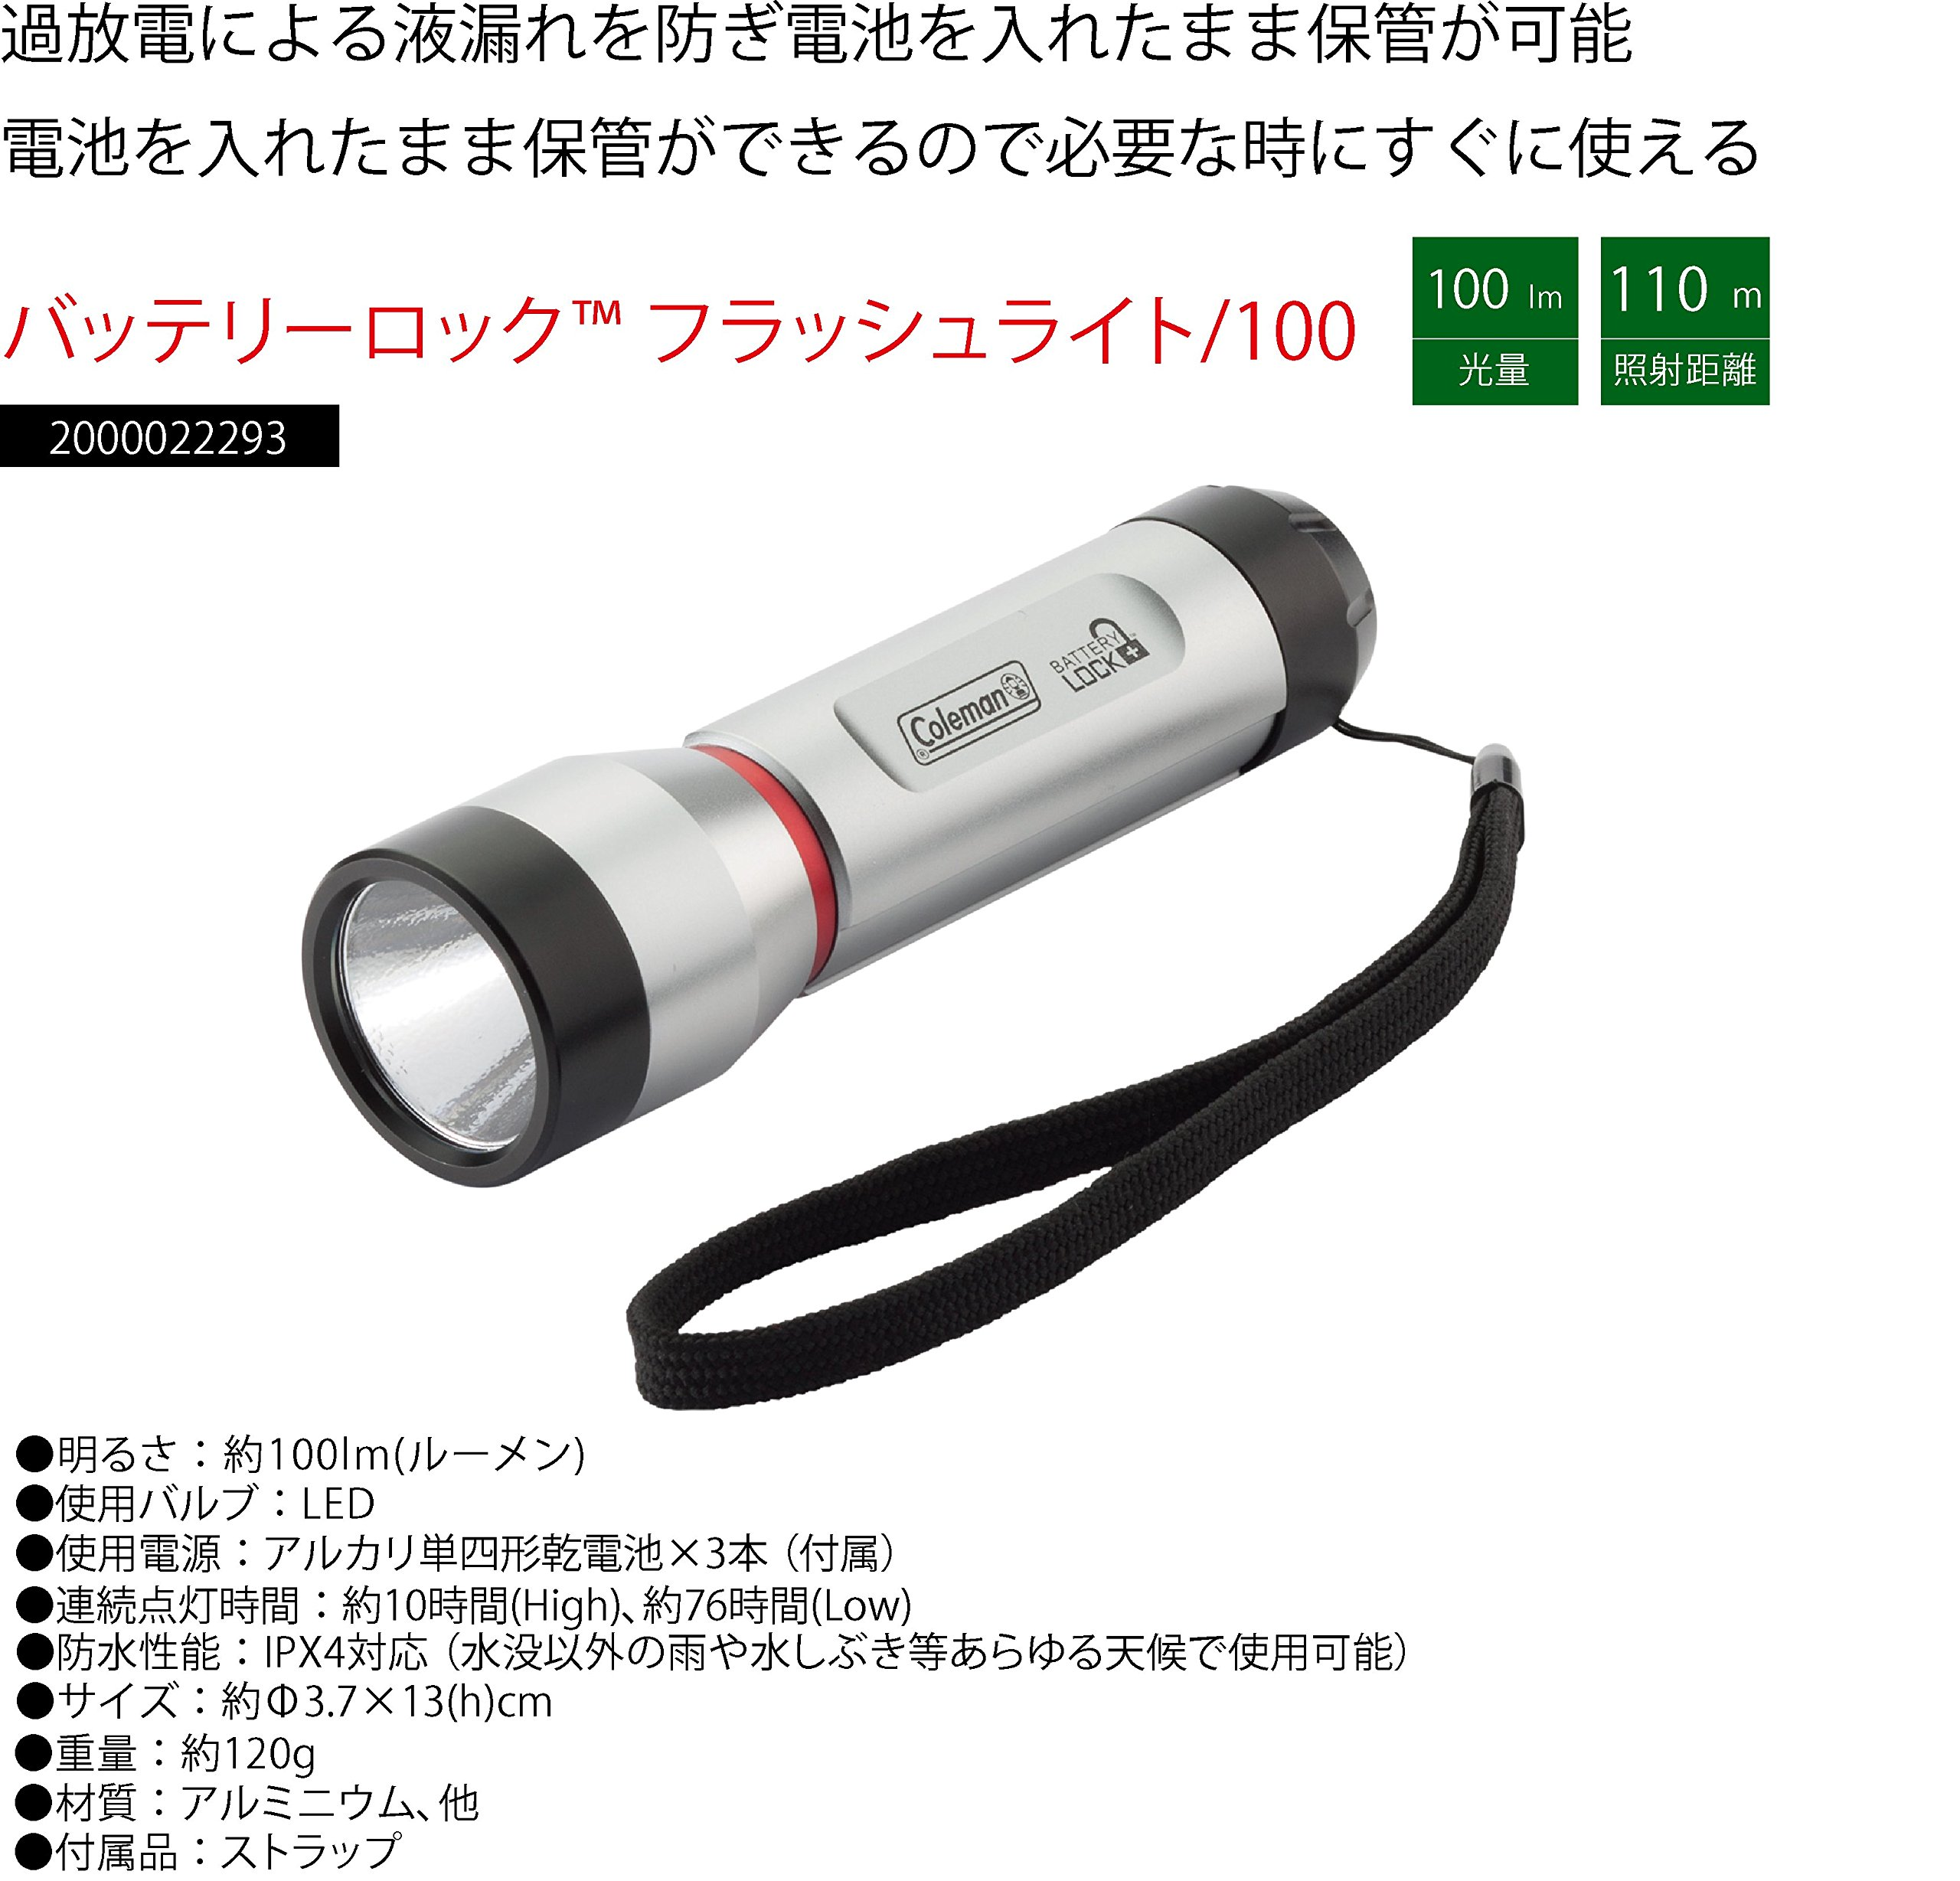 Coleman (Coleman) Light battery lock flash light / 100 2000022293 by Coleman (Coleman) (Image #2)